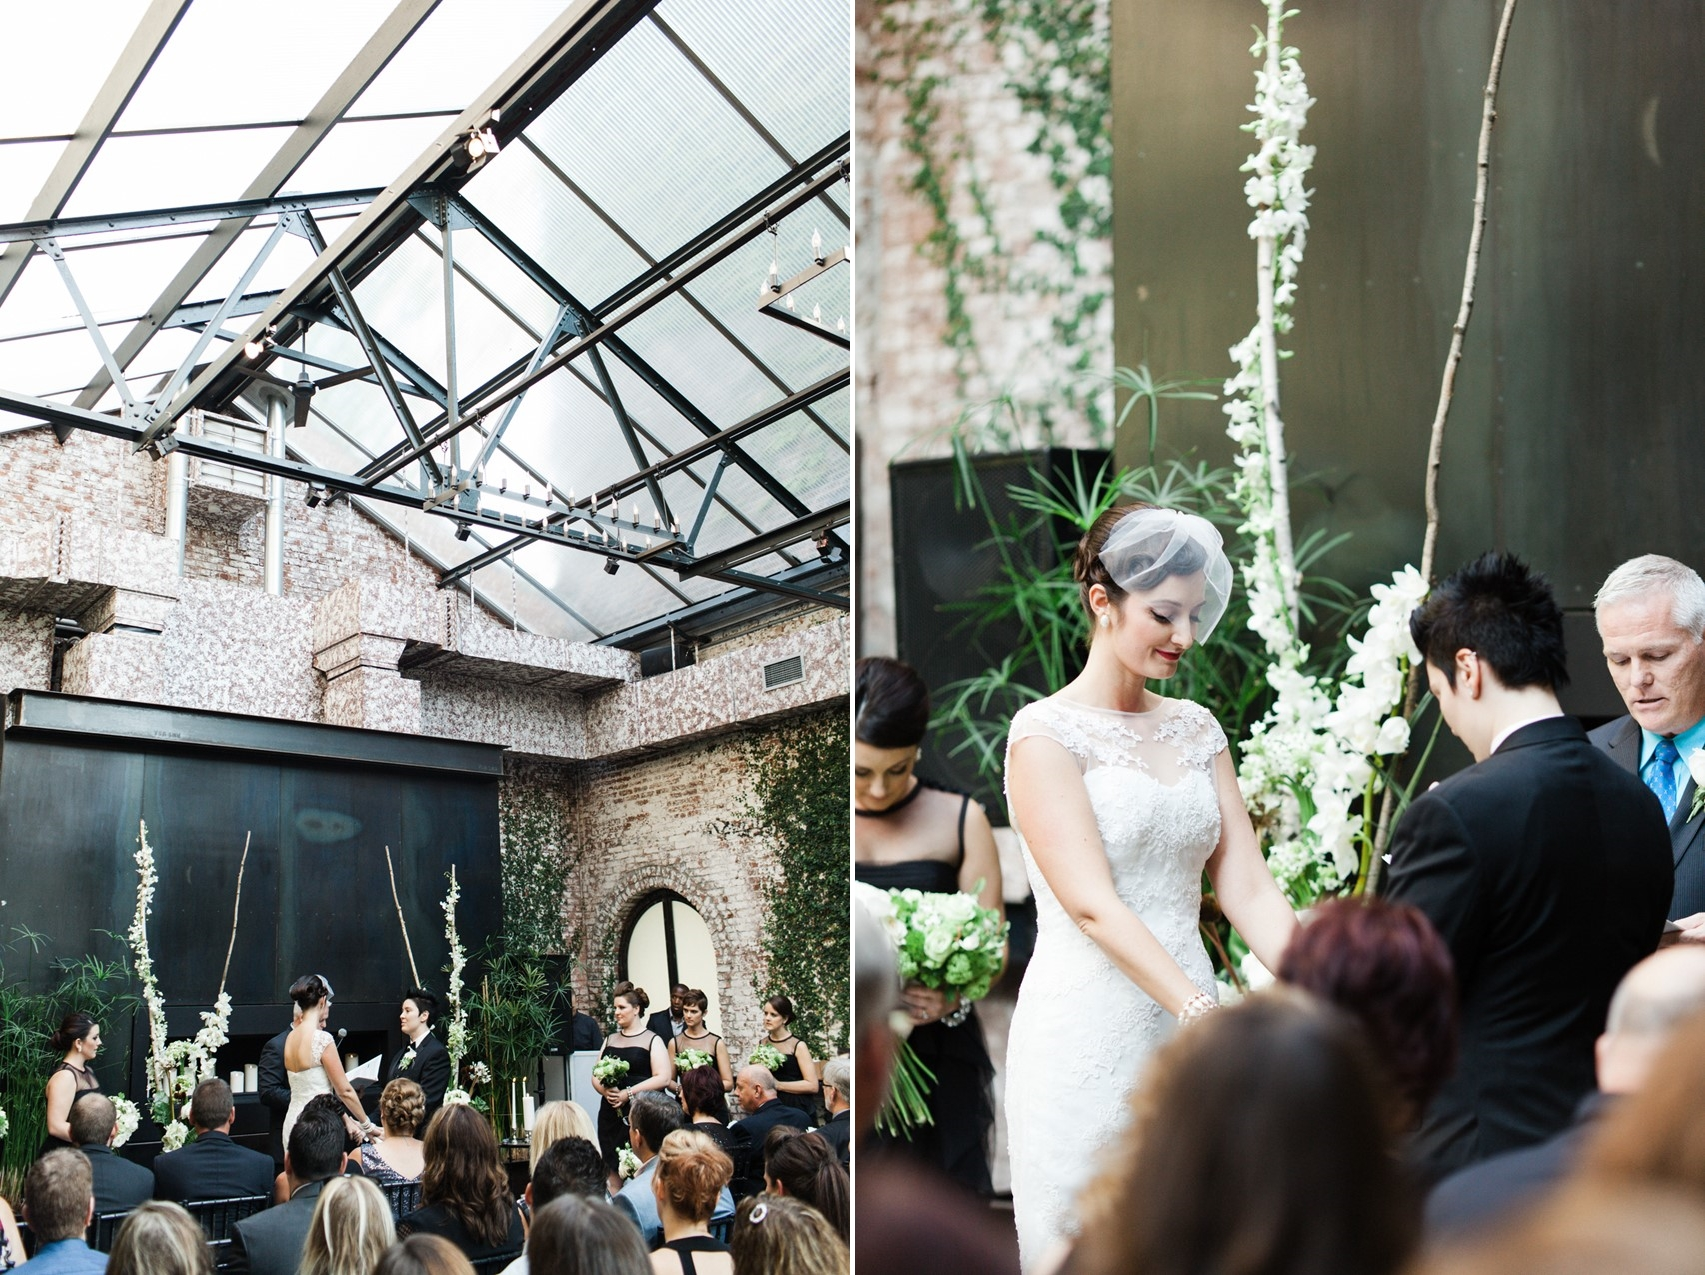 Same Sex Wedding - A Vintage Inspired City Wedding in a Crisp and Elegant Palette of Ivory, Black & Green